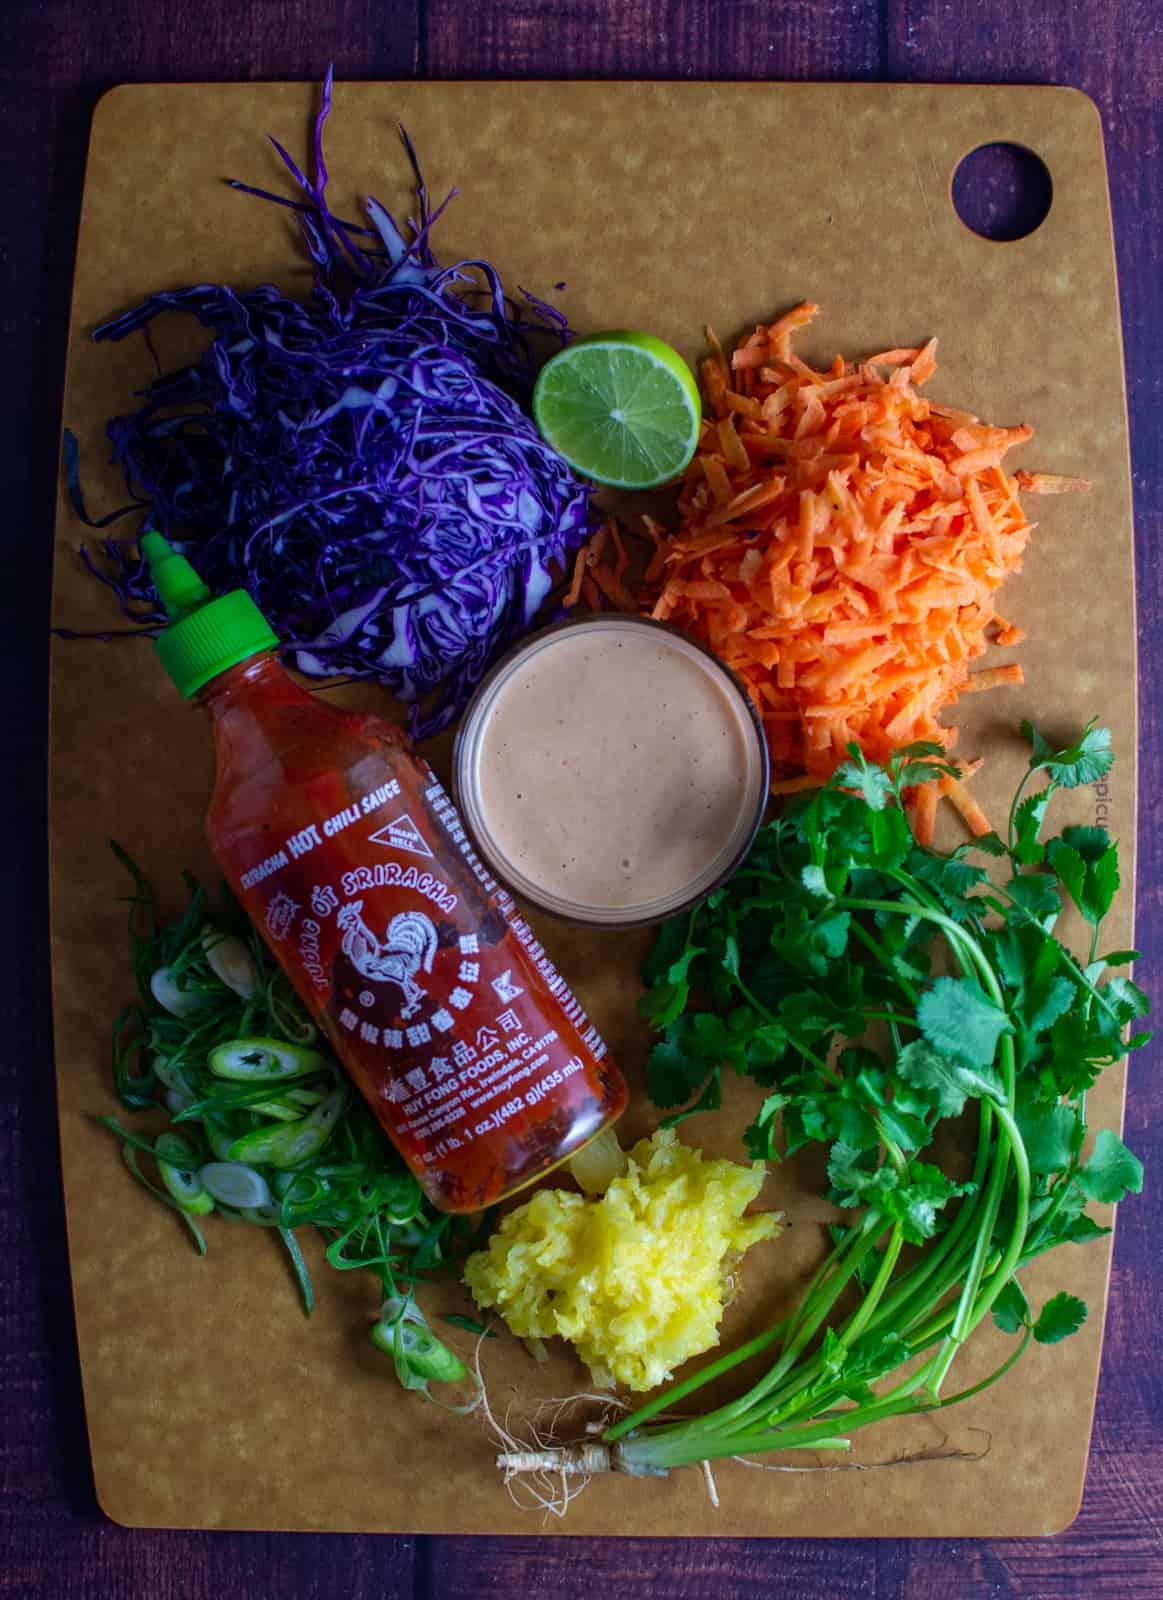 slaw ingredients and sriracha mayo